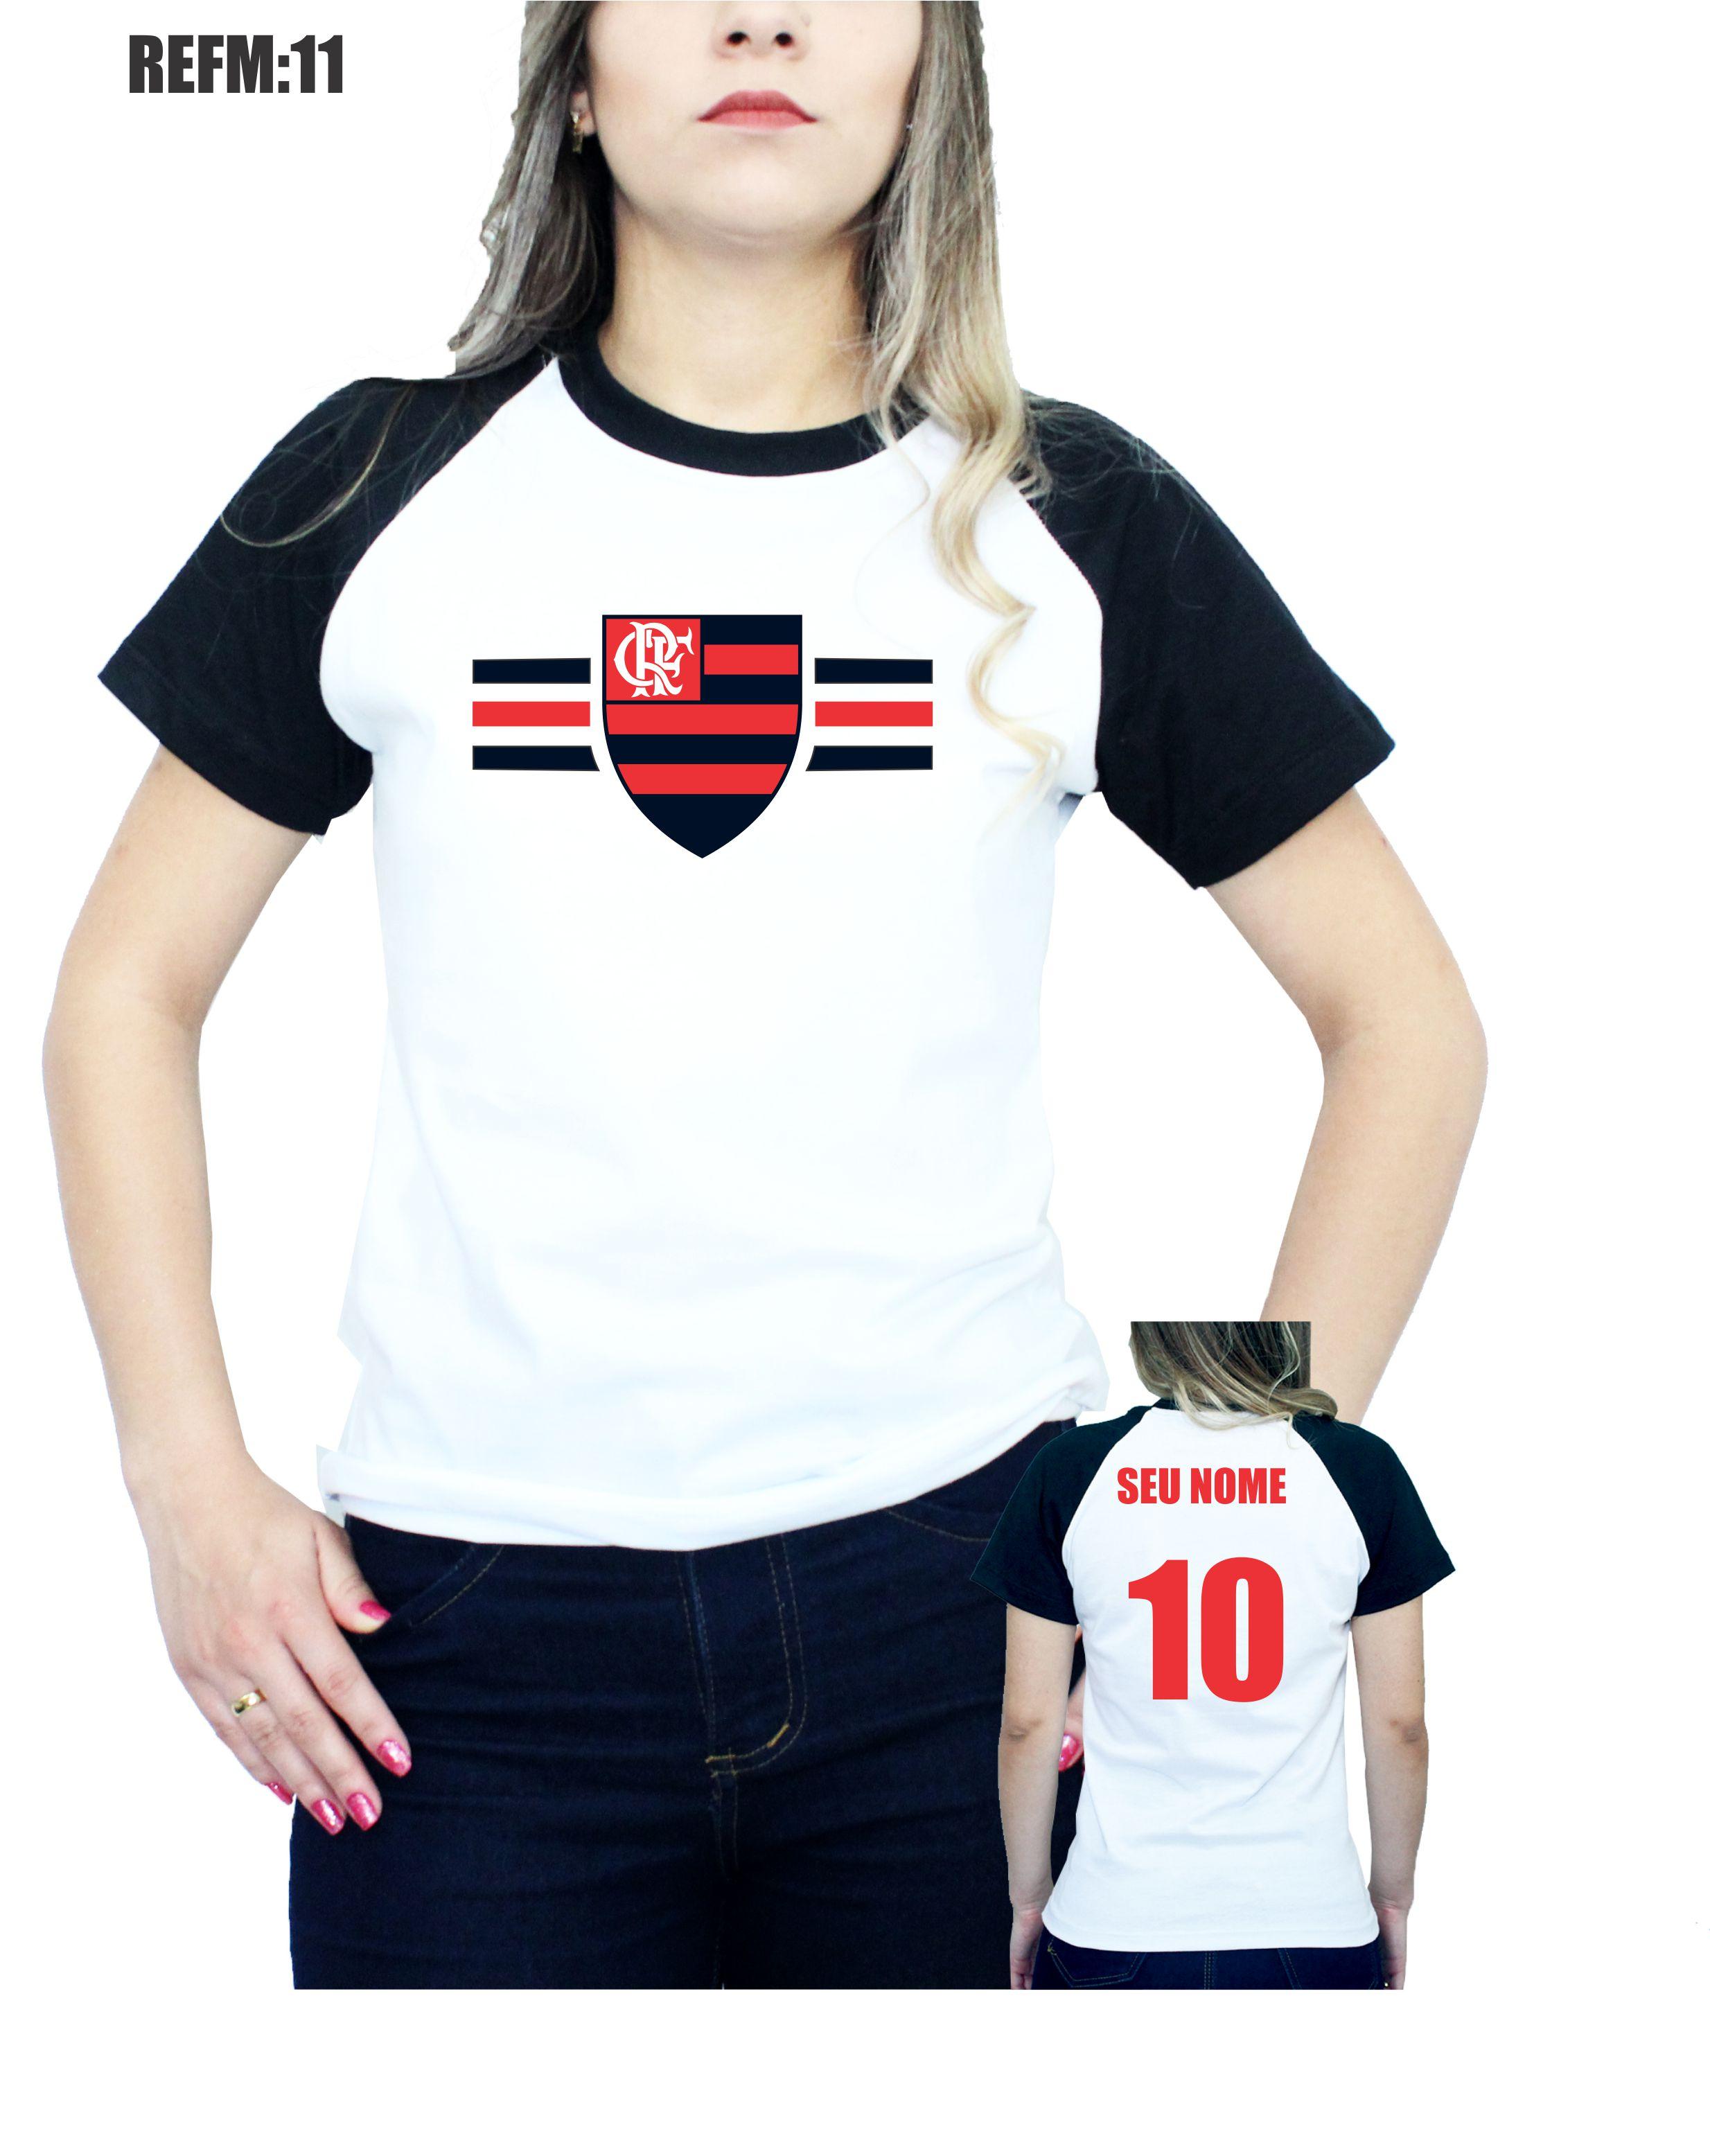 Camisetas de Times de Futebo  81ec7f1619c9f